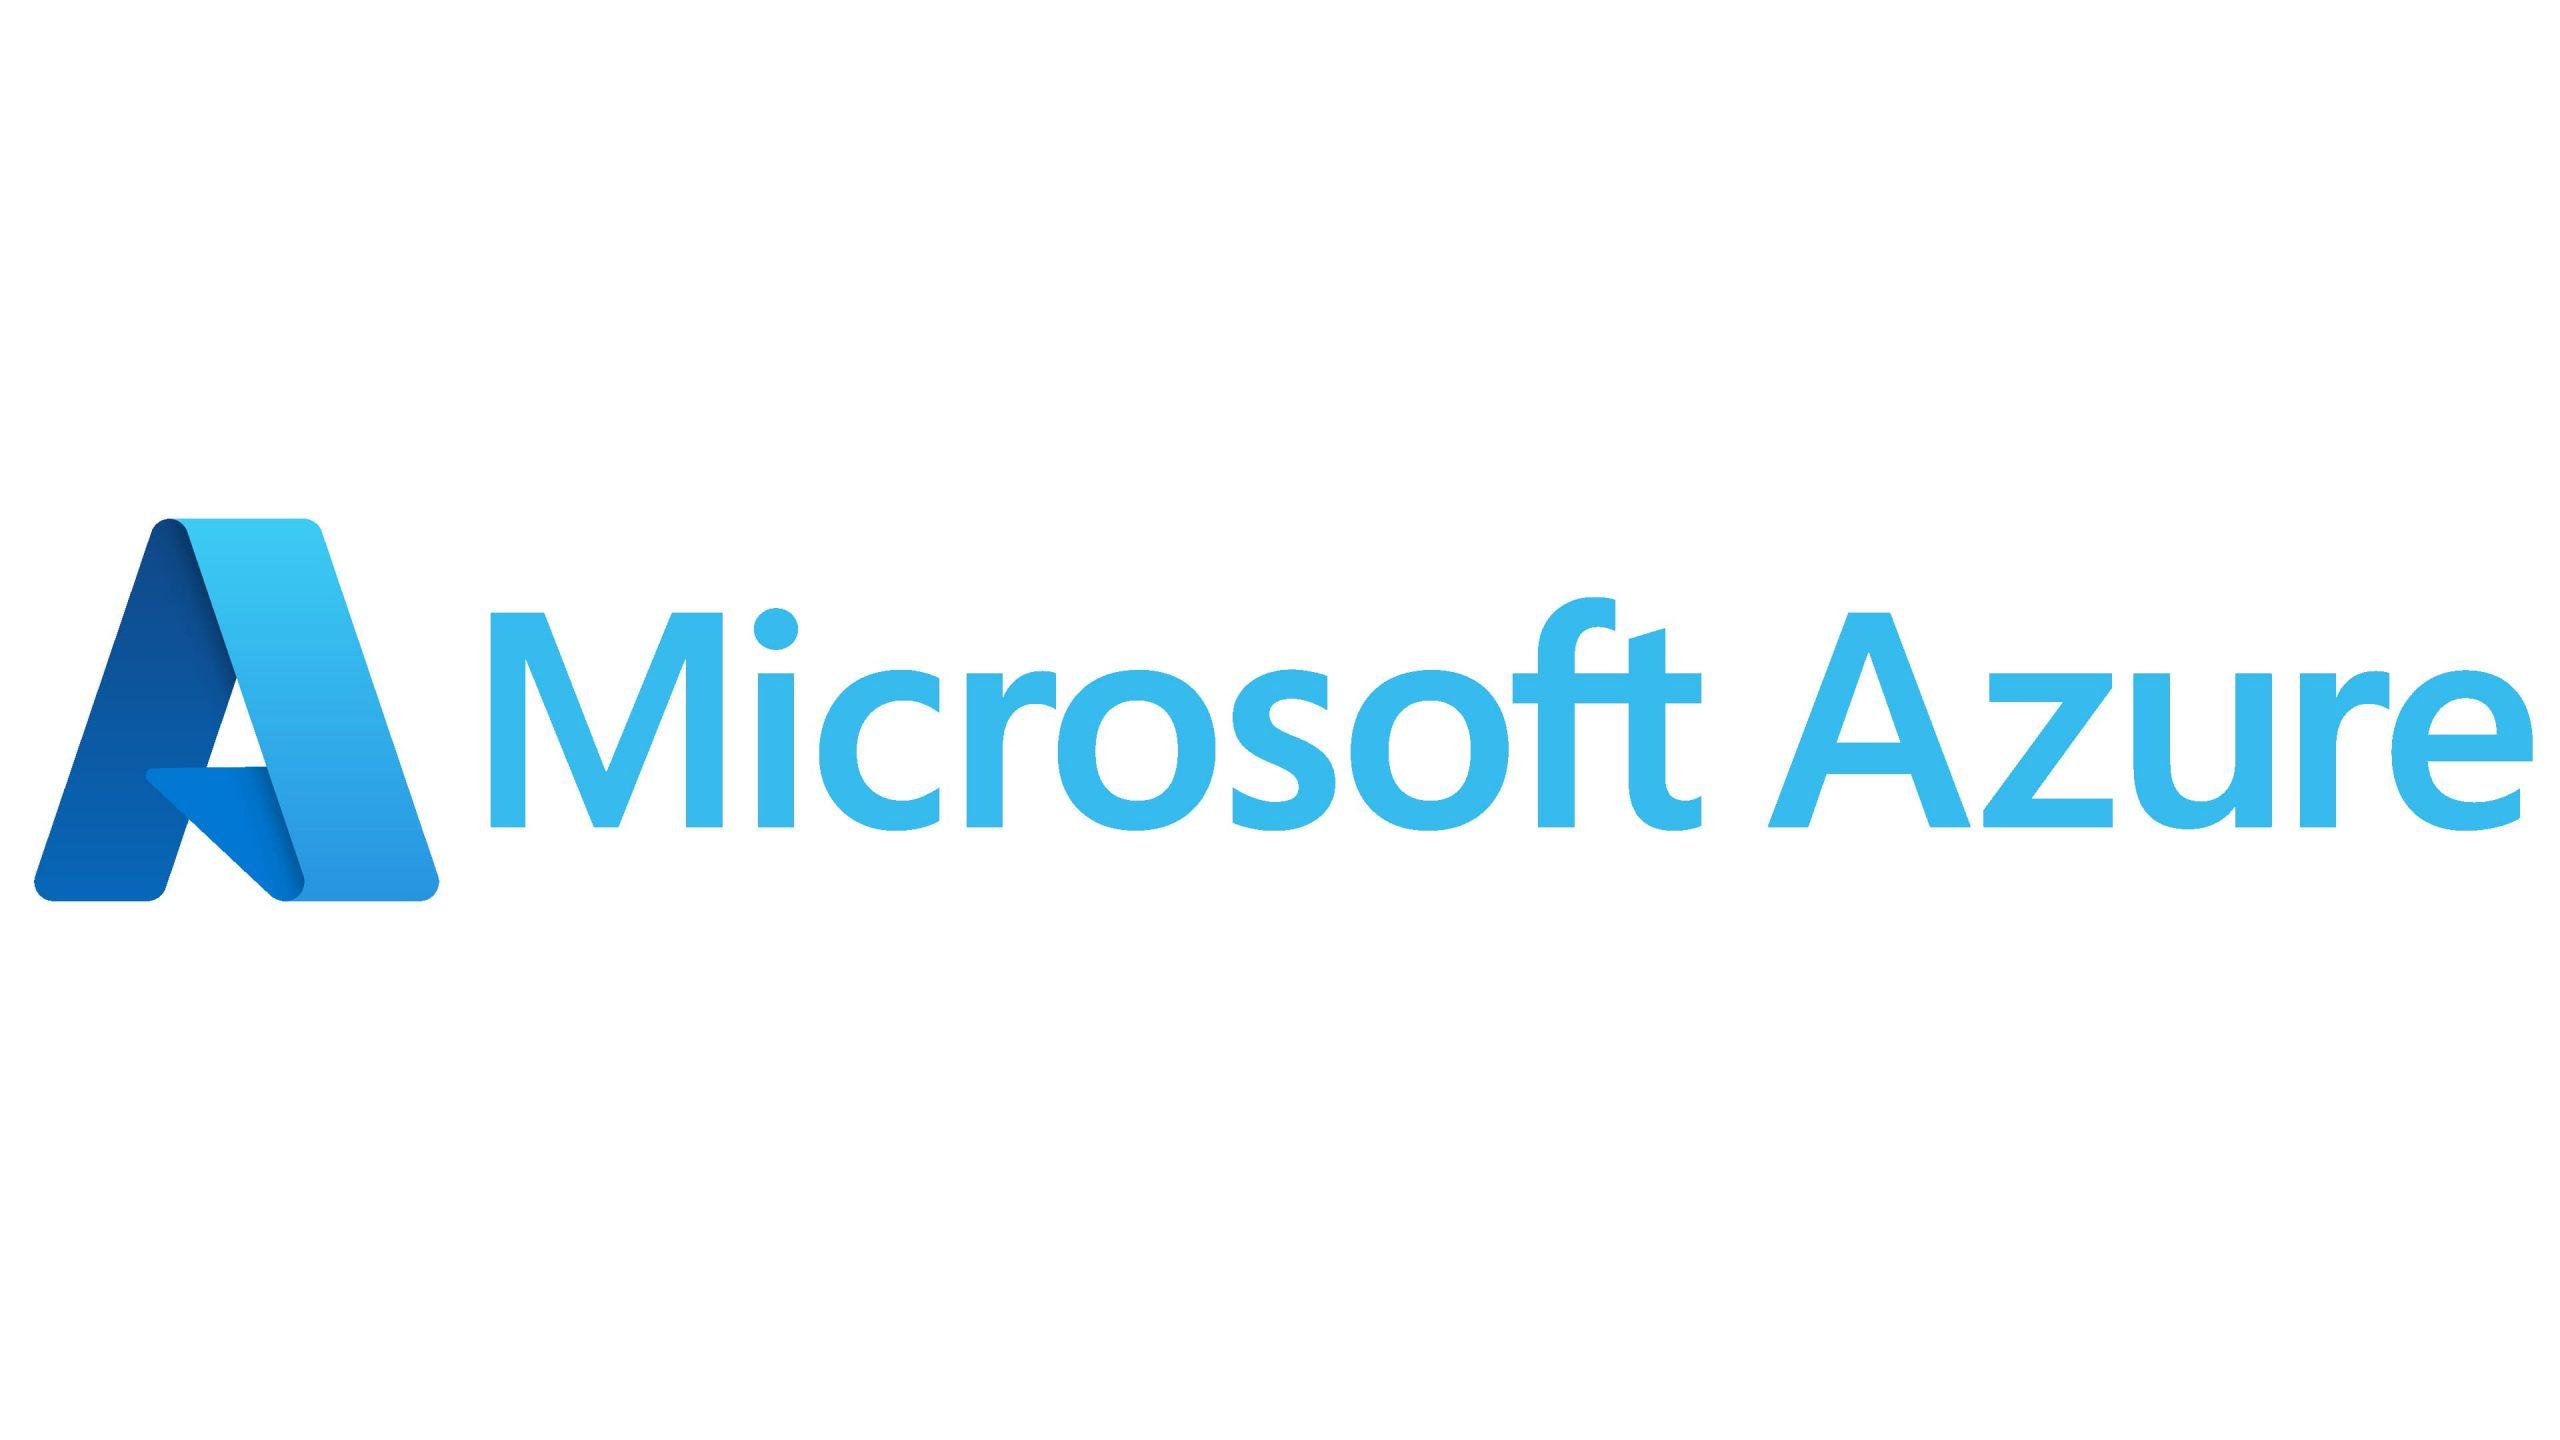 azure logotype